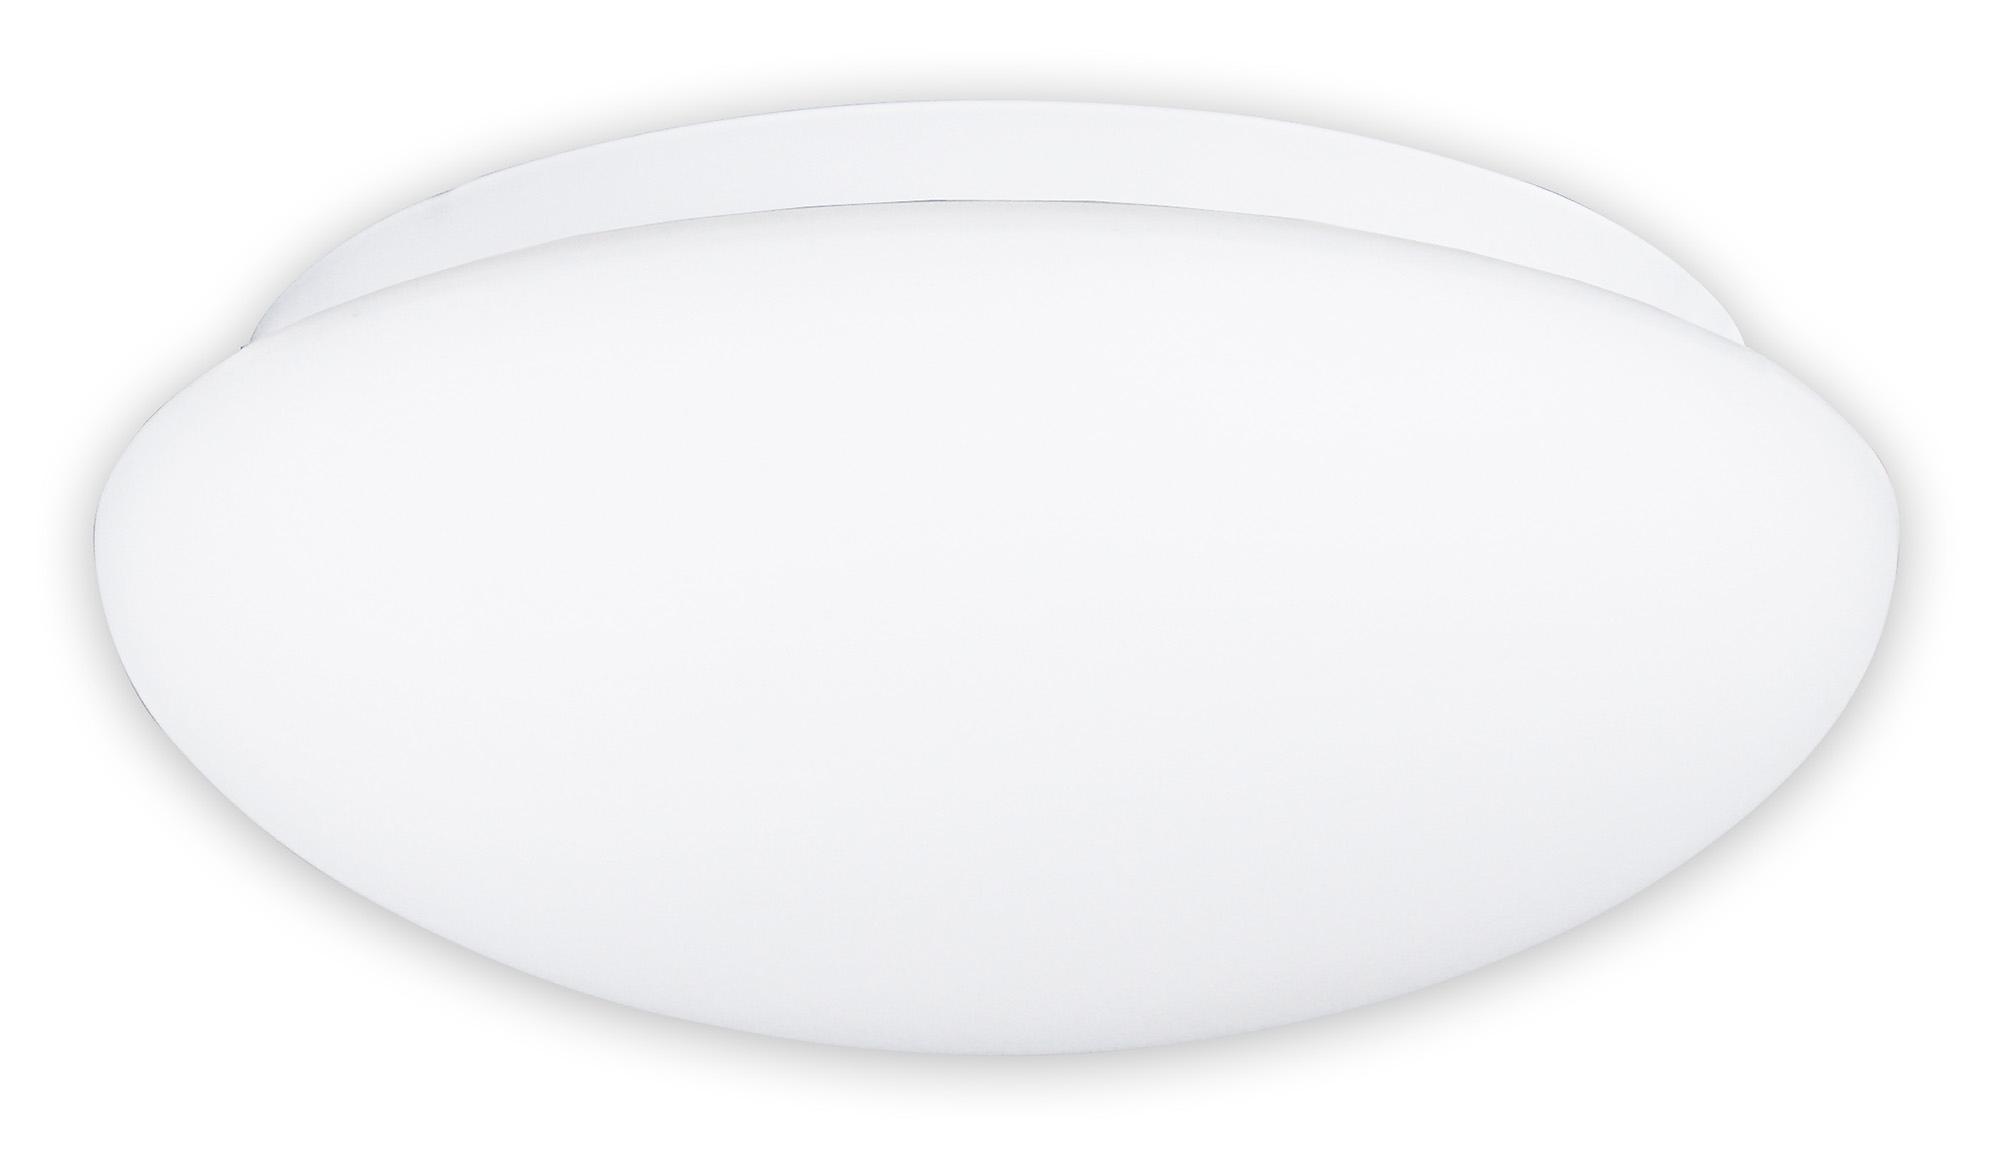 näve NÄVE LED-plafondlamp met sensor - gratis ruilen op otto.nl